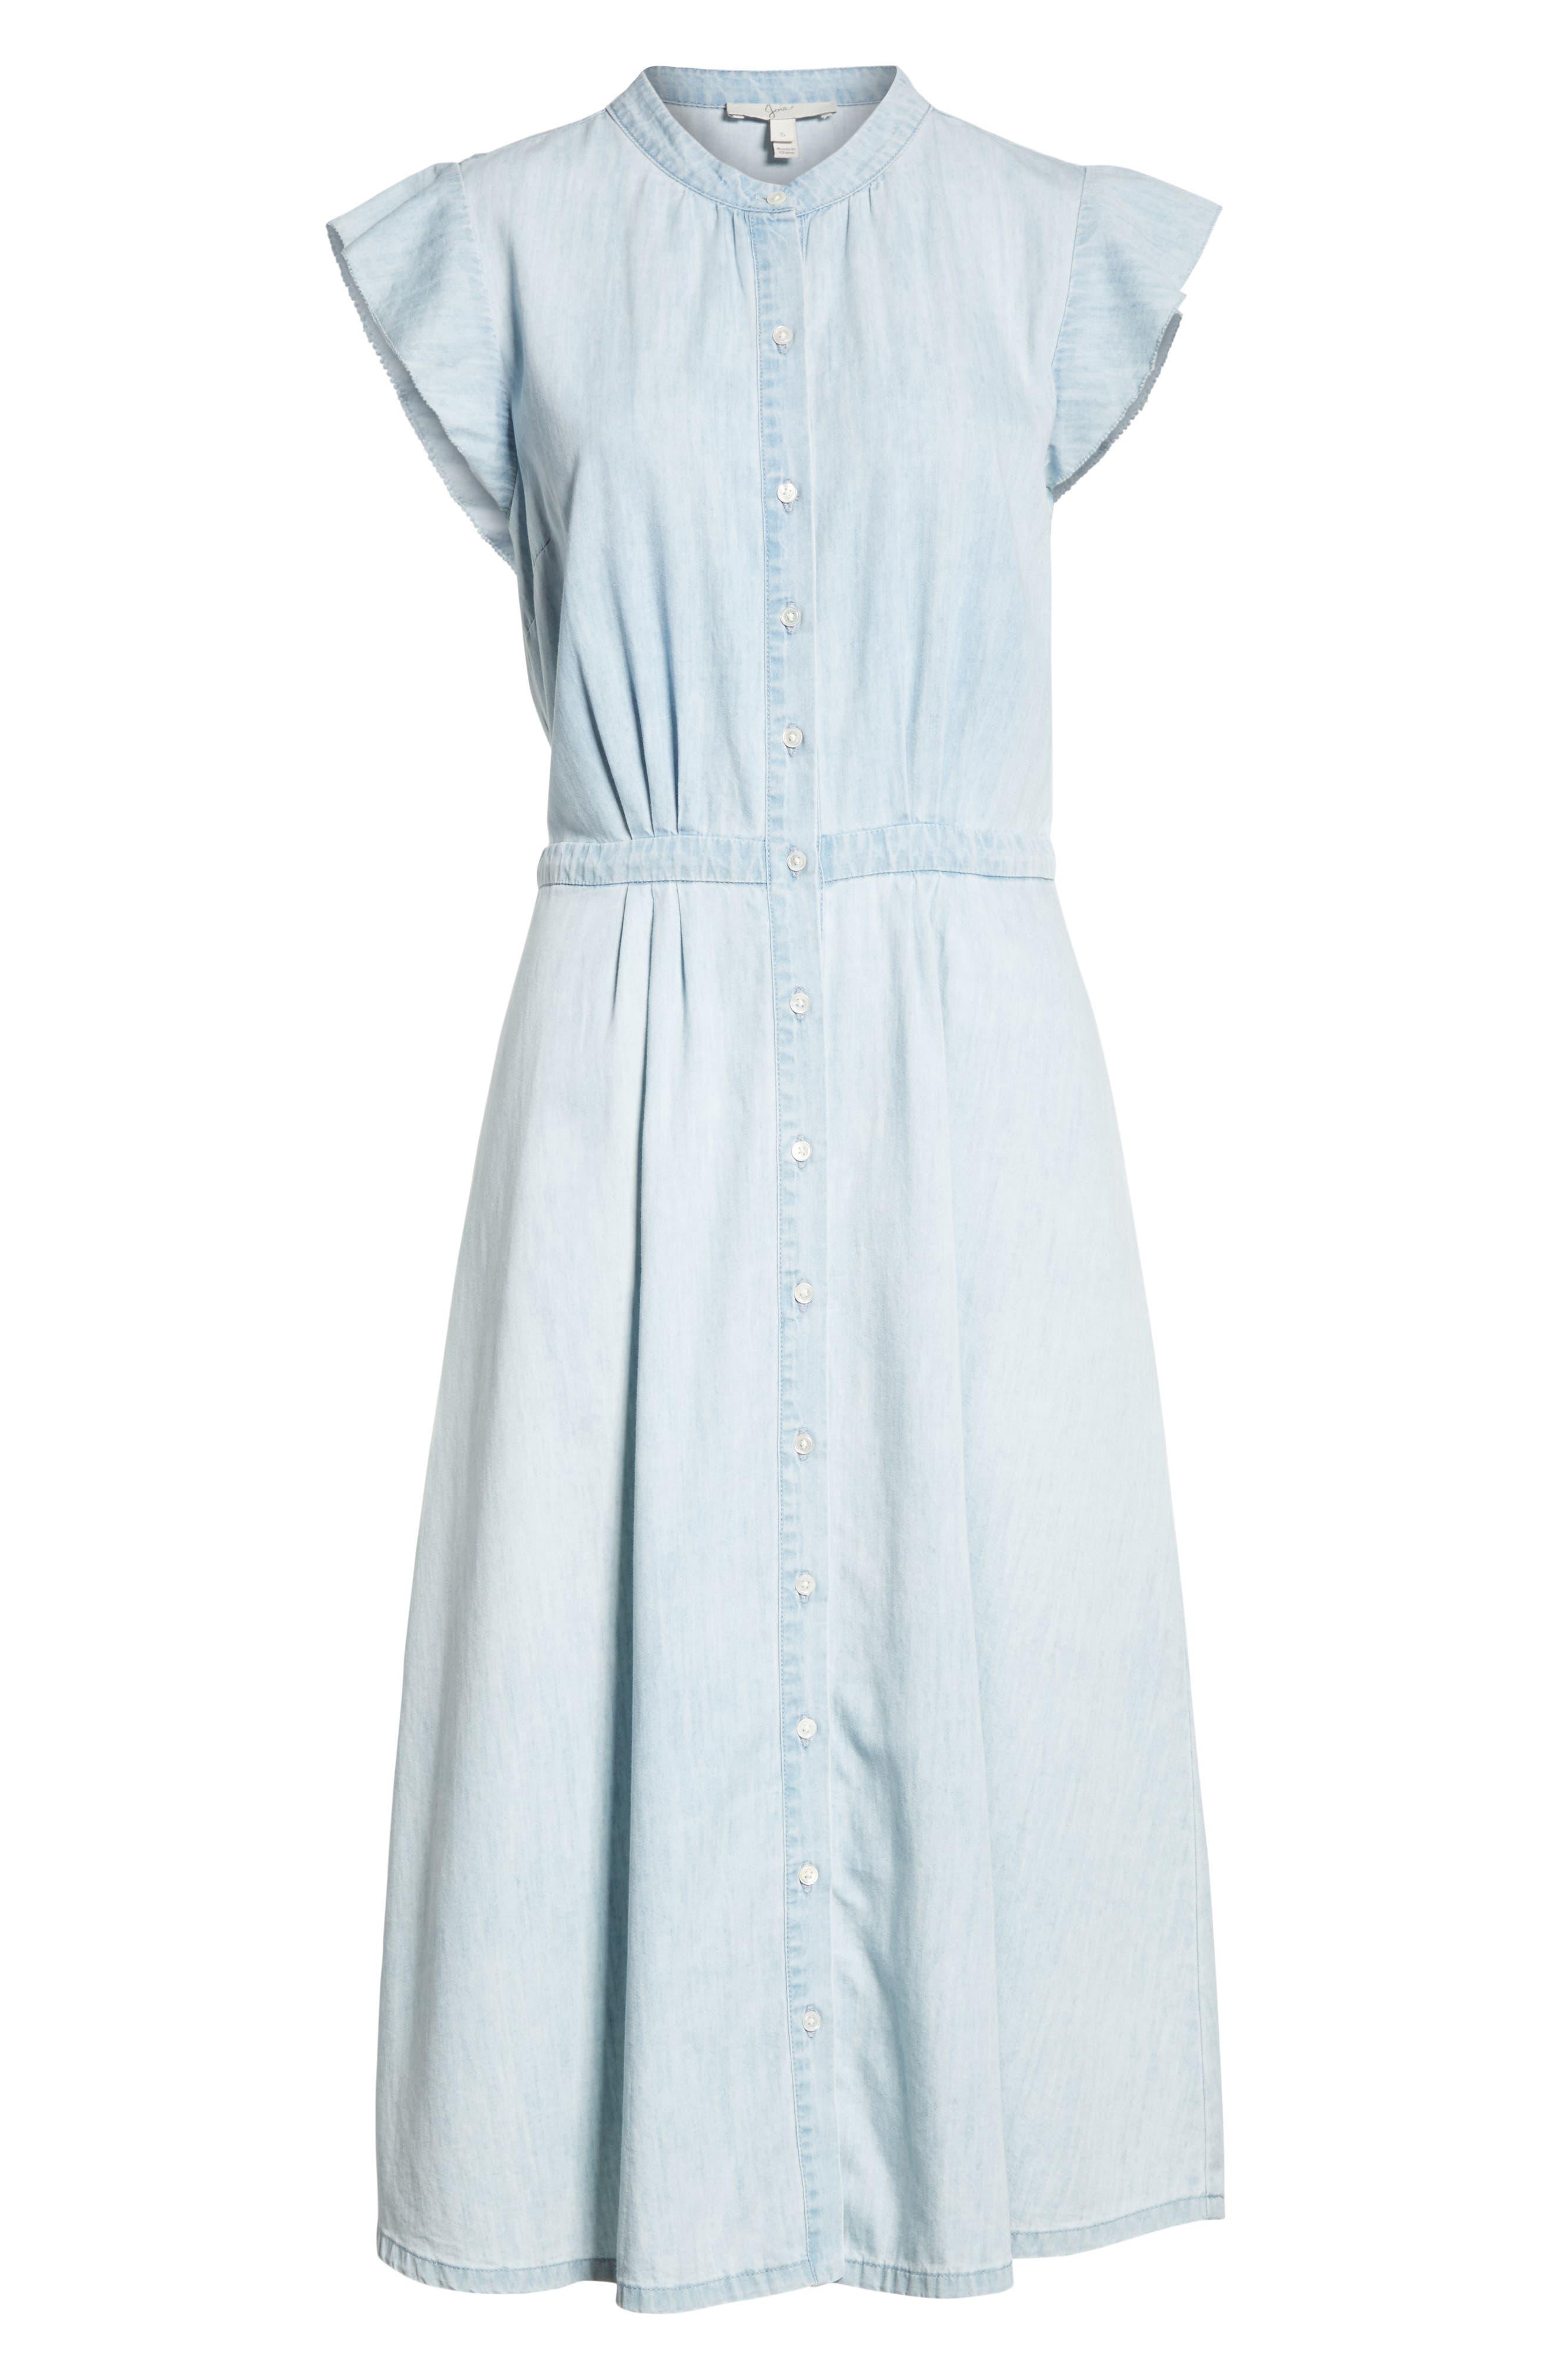 Awel Ruffle Chambray Shirtdress,                             Alternate thumbnail 6, color,                             Western Fade